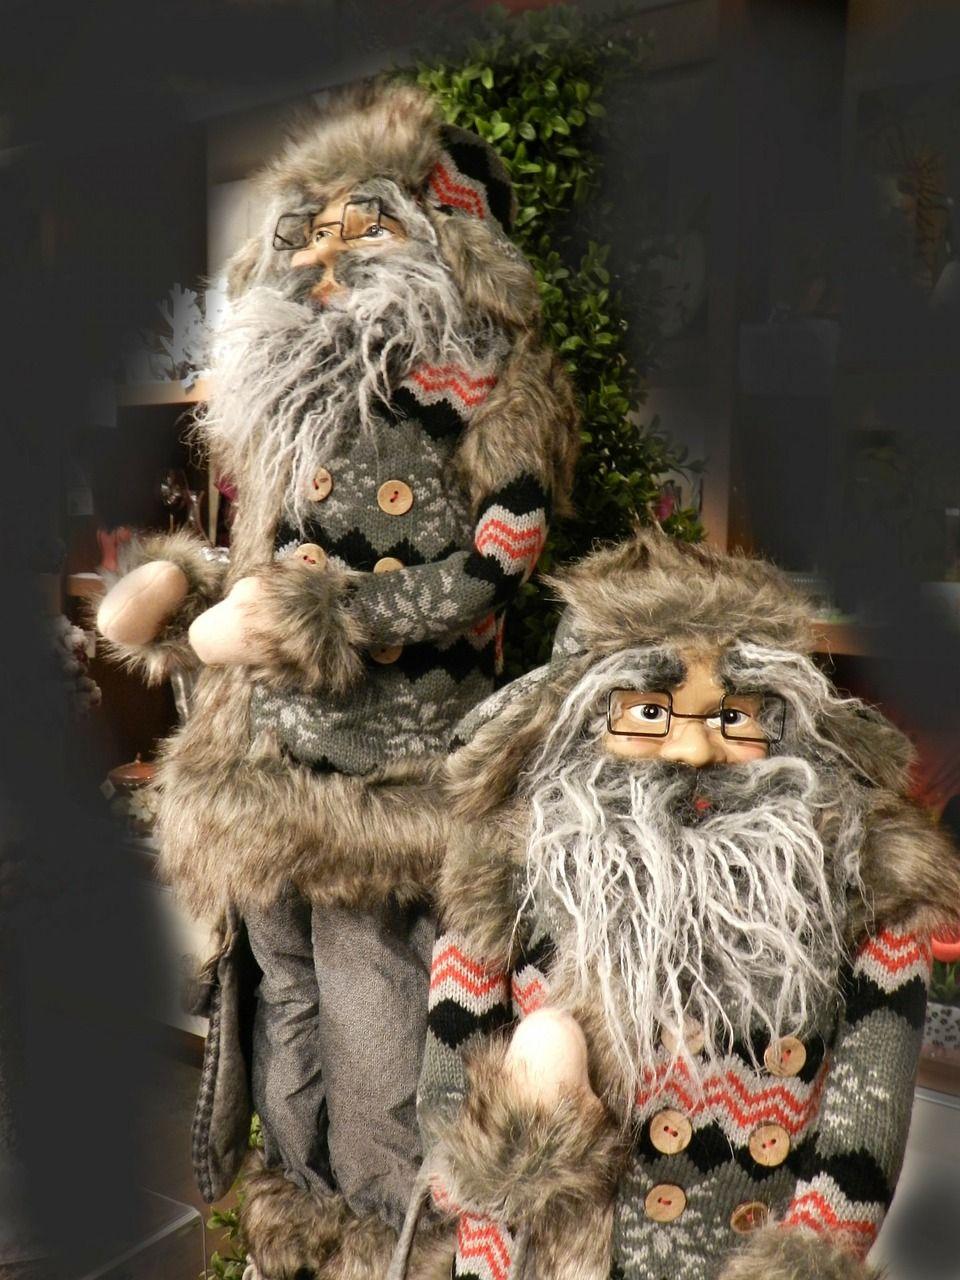 Vacation, Gnomes, Gnome, Dwarf, Dwarfs, Decorative